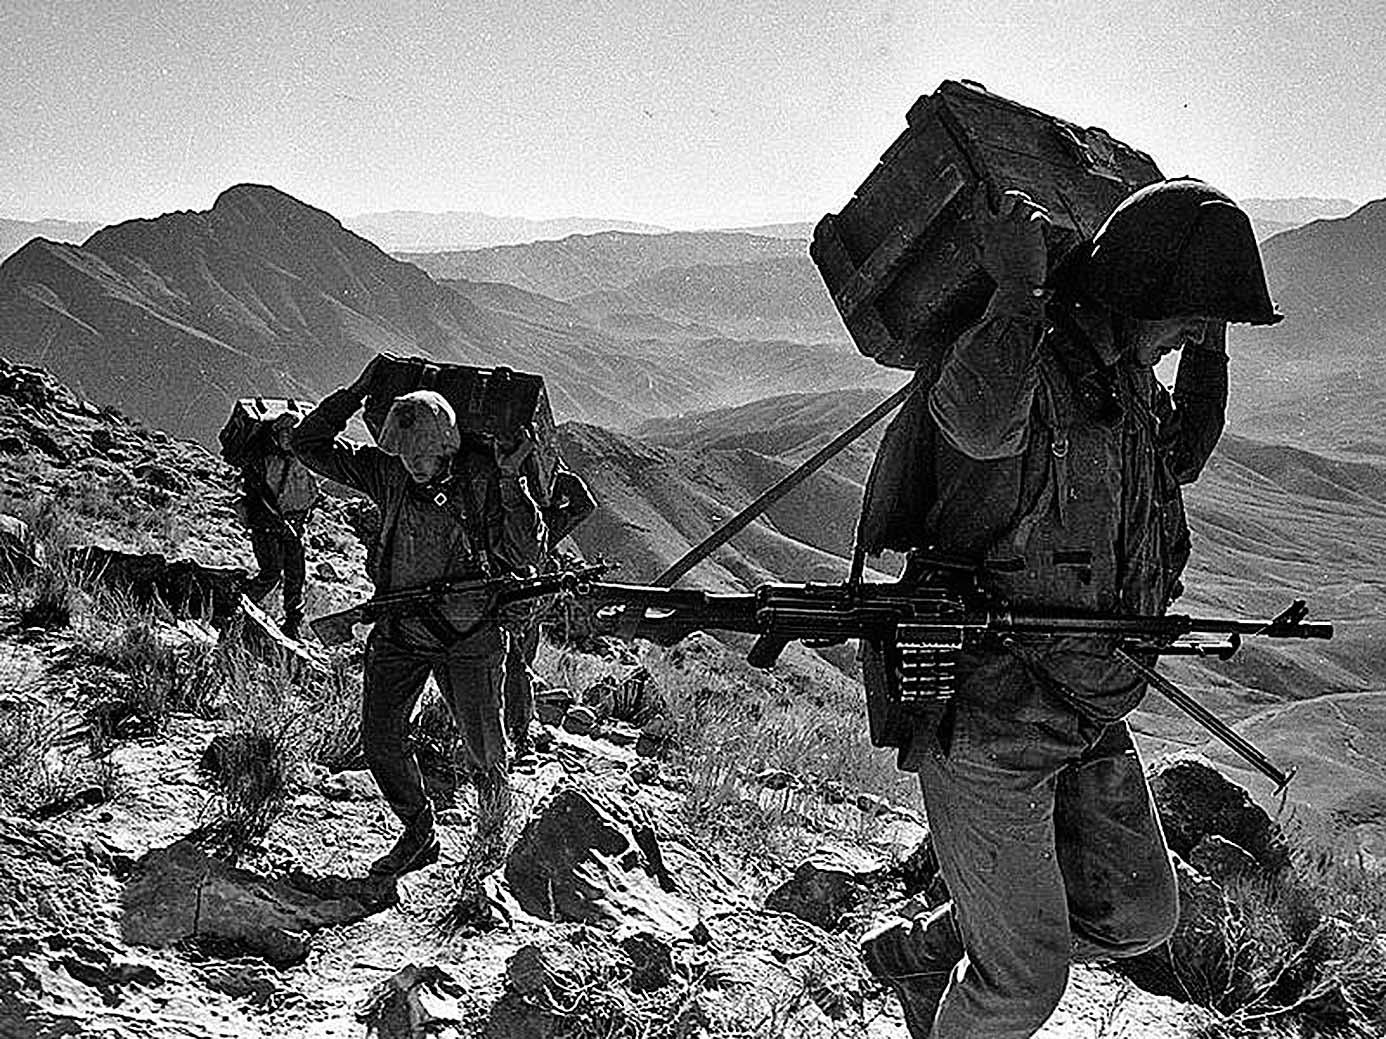 Soviet Afghanistan war - Page 7 1293791727_afganistan_14